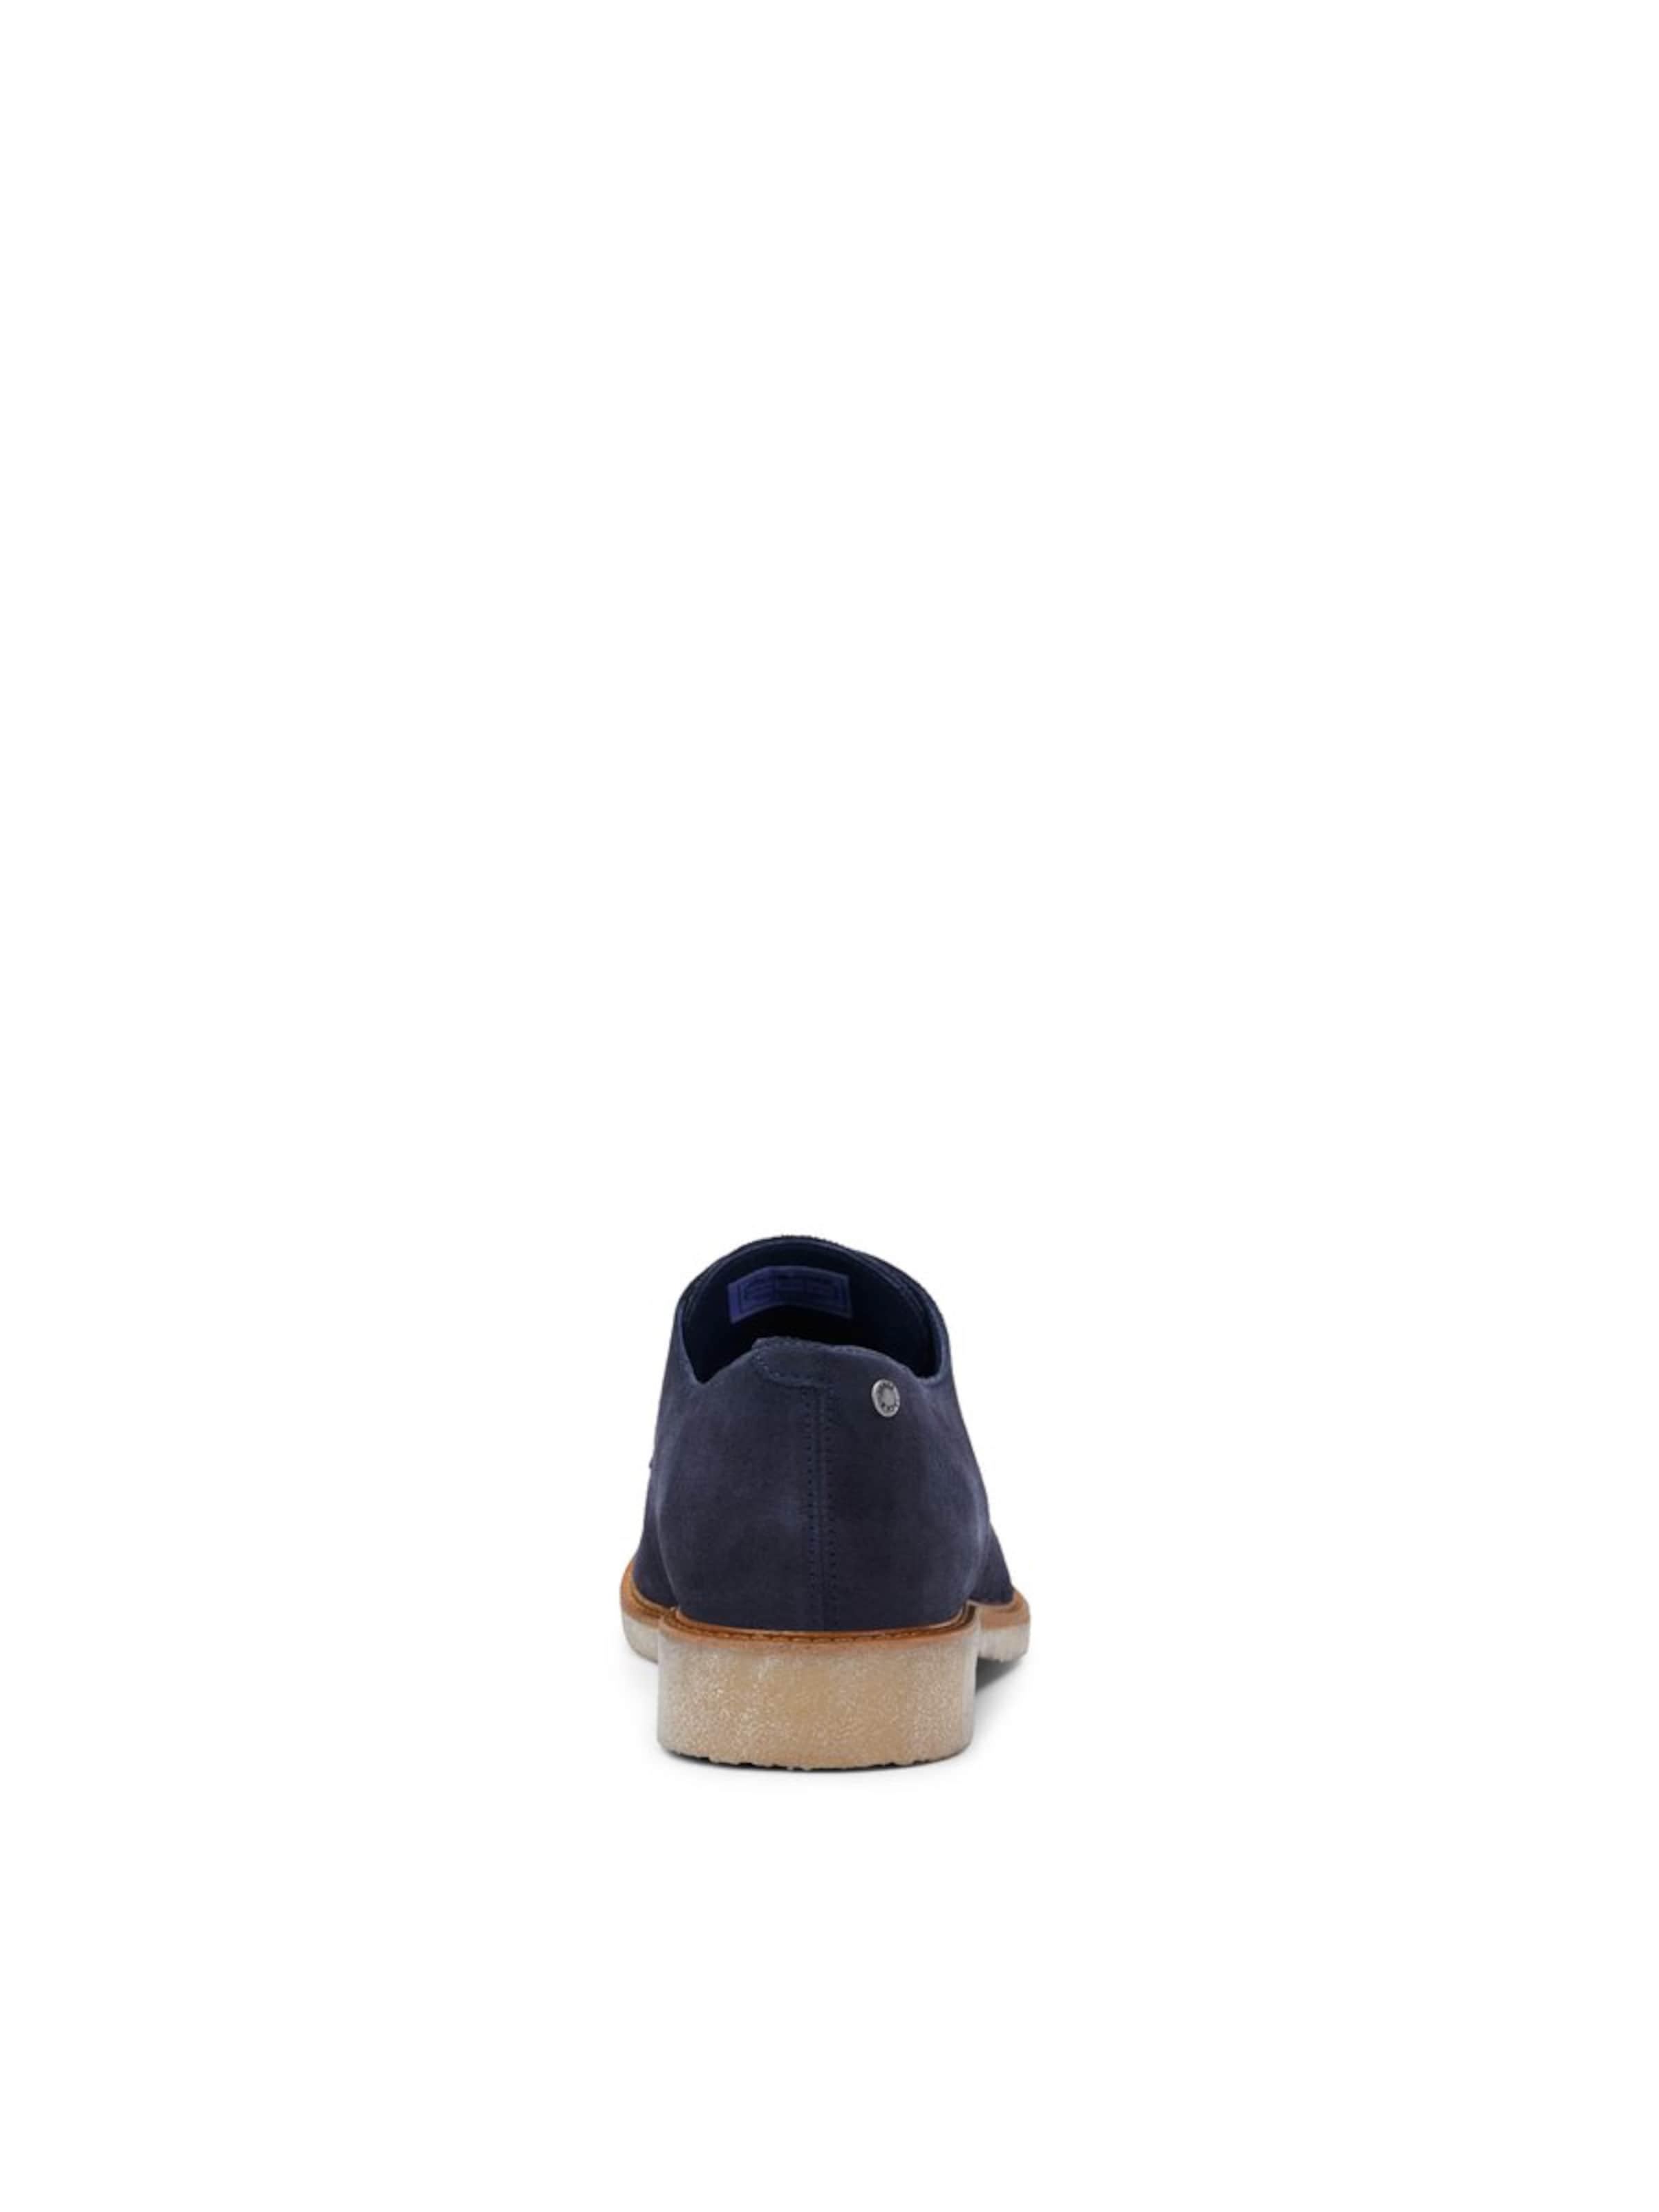 Jackamp; En Chaussure Marine Lacets Jones Bleu À pSqzMGLUV